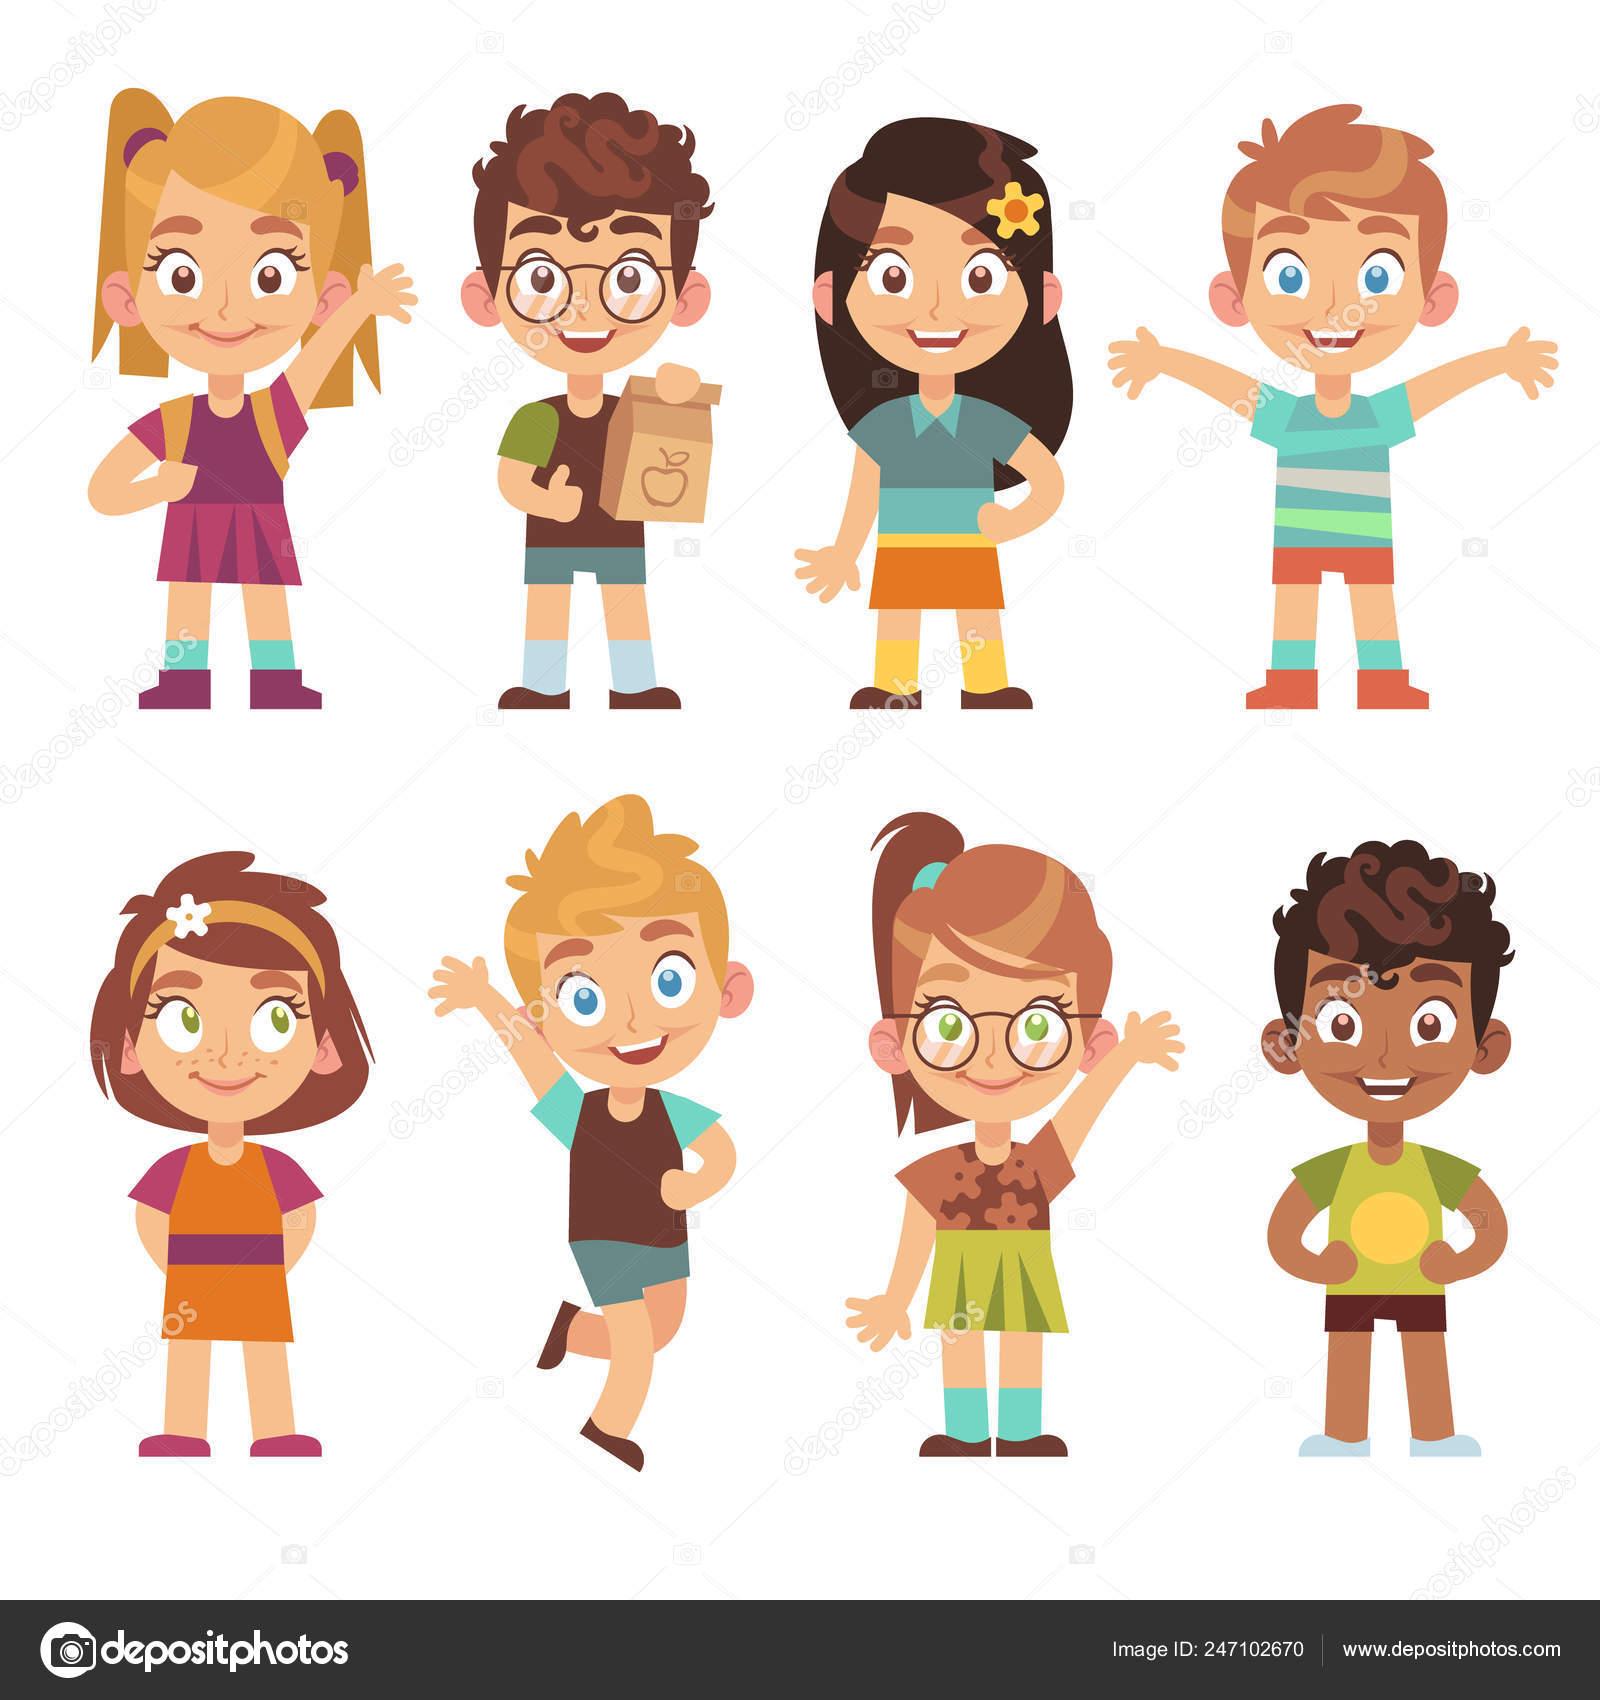 Funny Cartoon Images Of Boys cute cartoon kids set. children girls boys standing kid